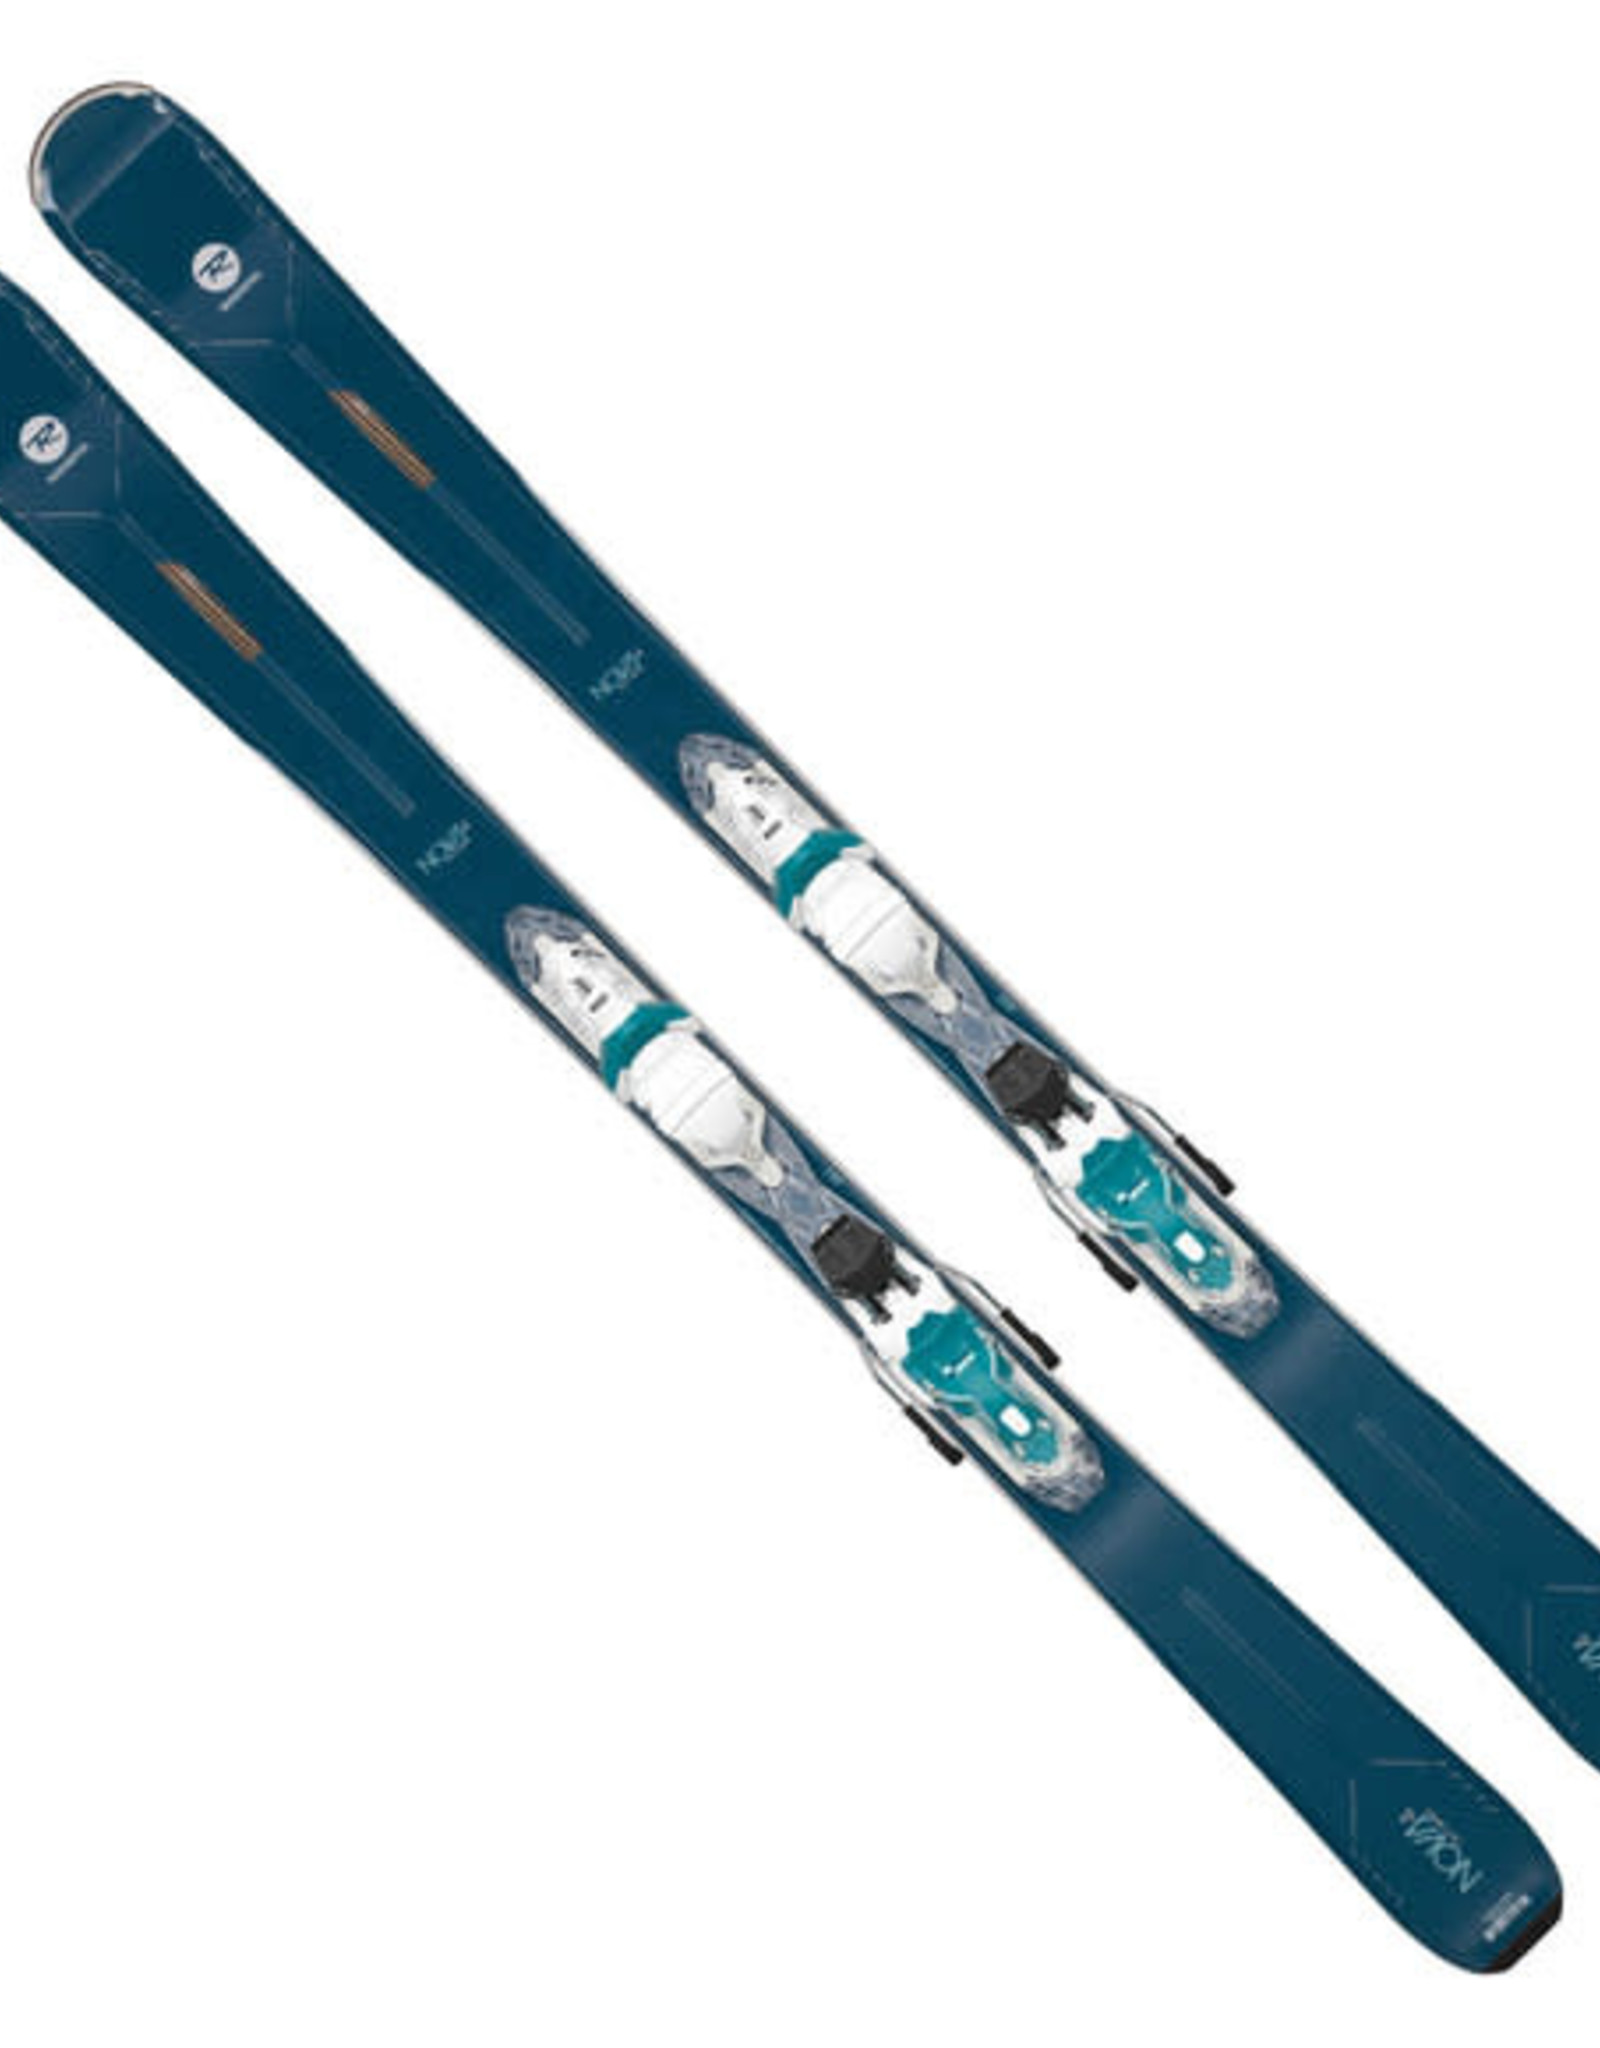 ROSSIGNOL Rossignol NOVA 4 CA/XP Women's Ski +Binding XP10 GW 146